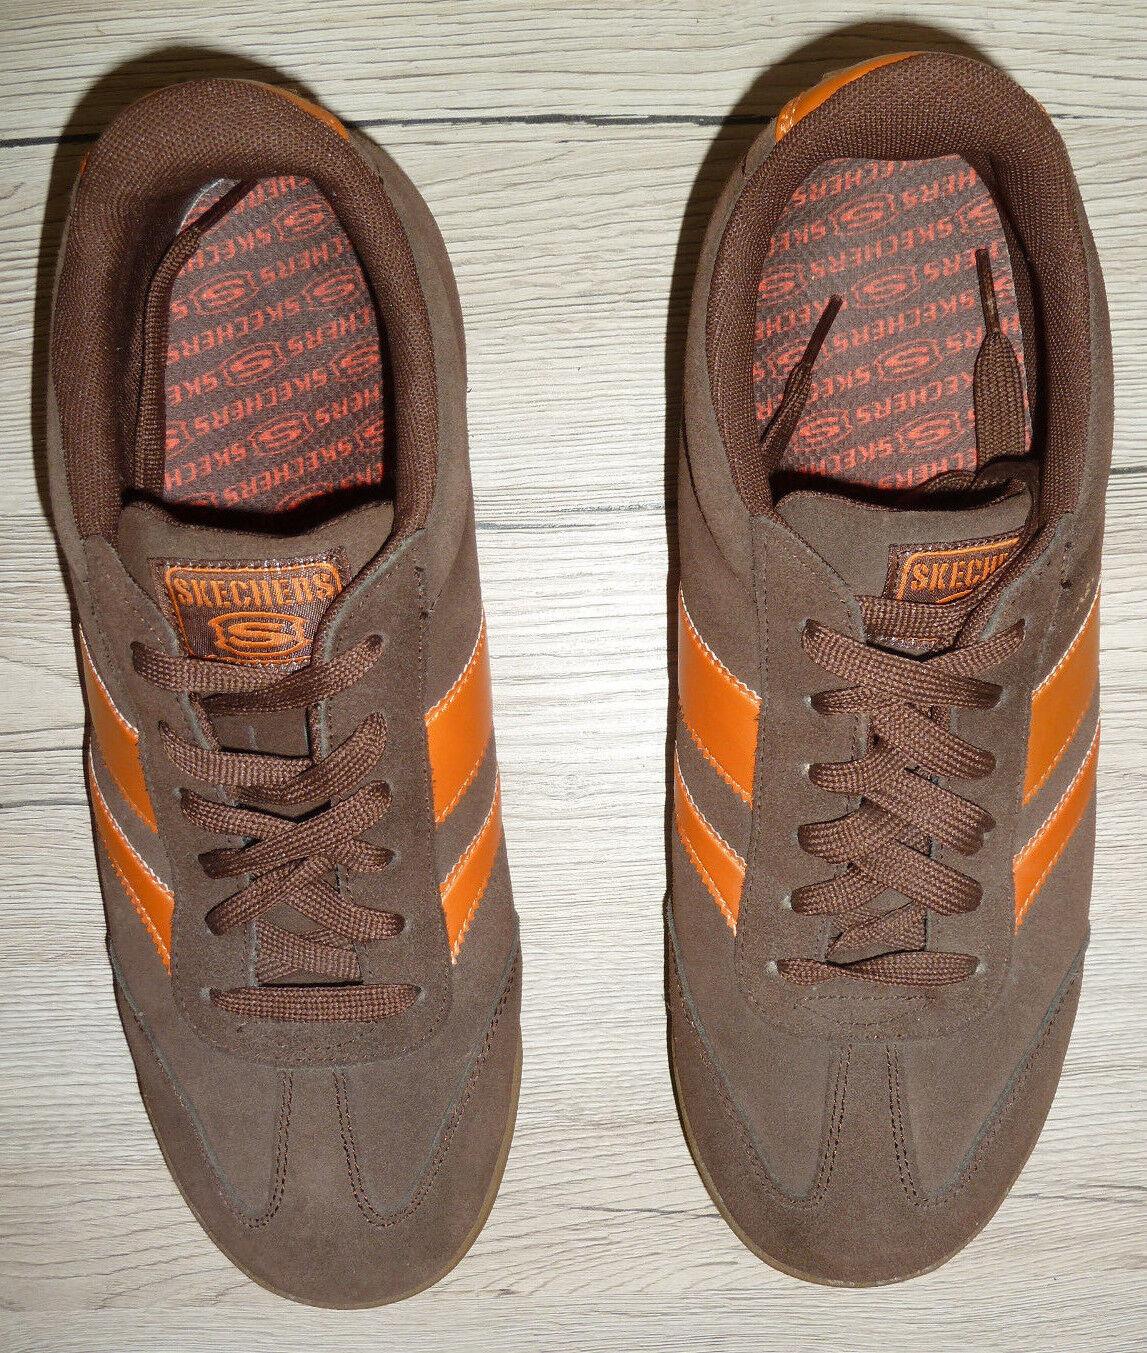 SKECHERS !! Herren Sneaker Turnschuhe Gr. 43 UK 9 // braun Veloursoptik